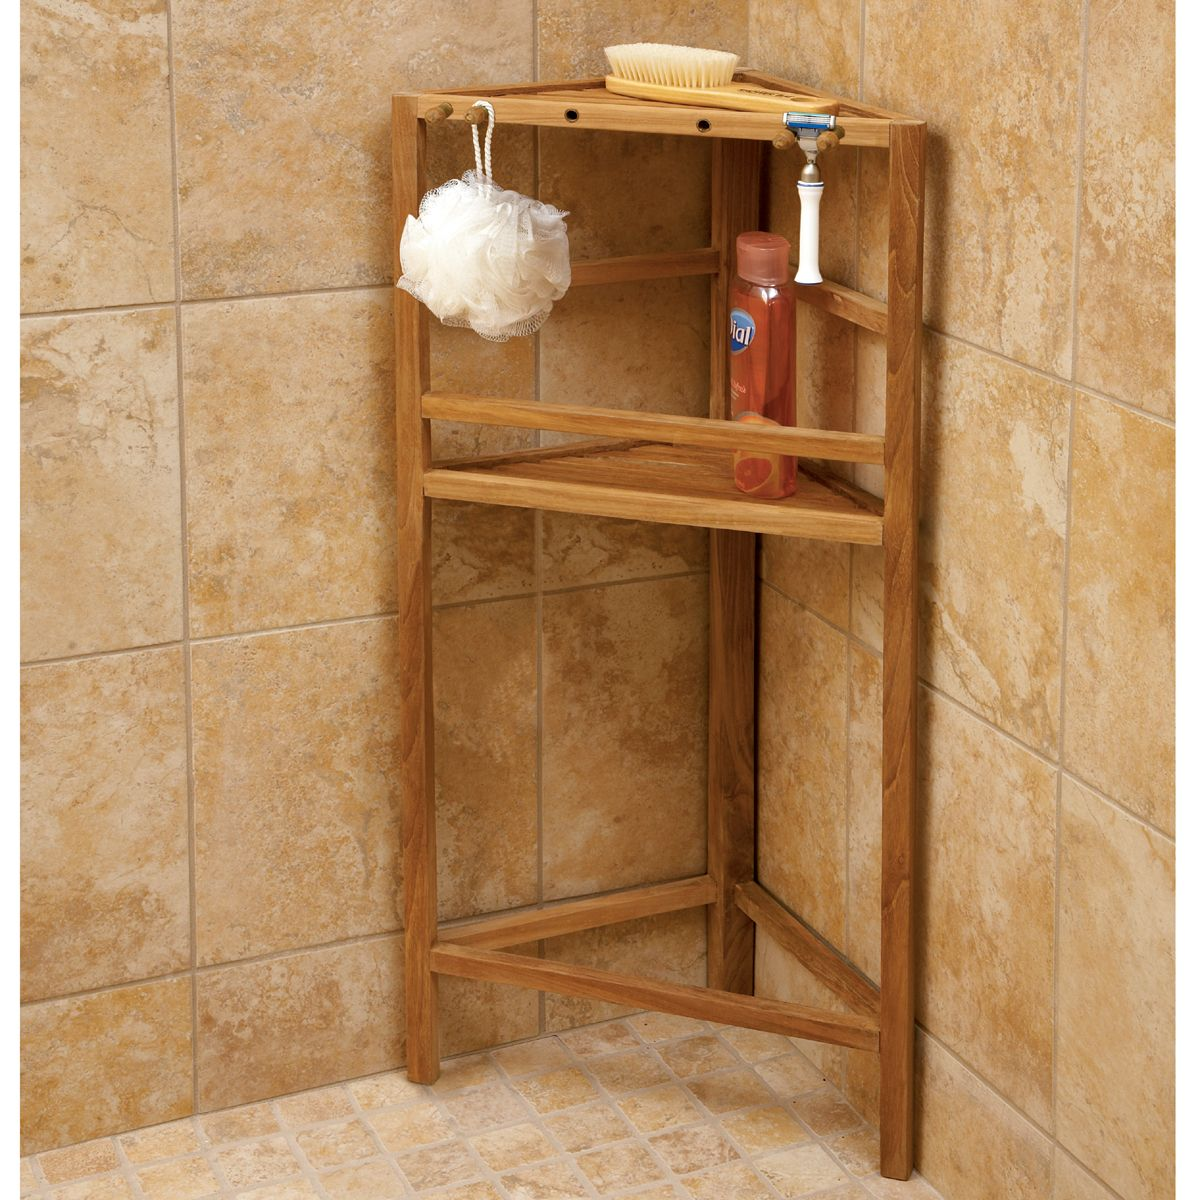 Images Of Bathroom organization